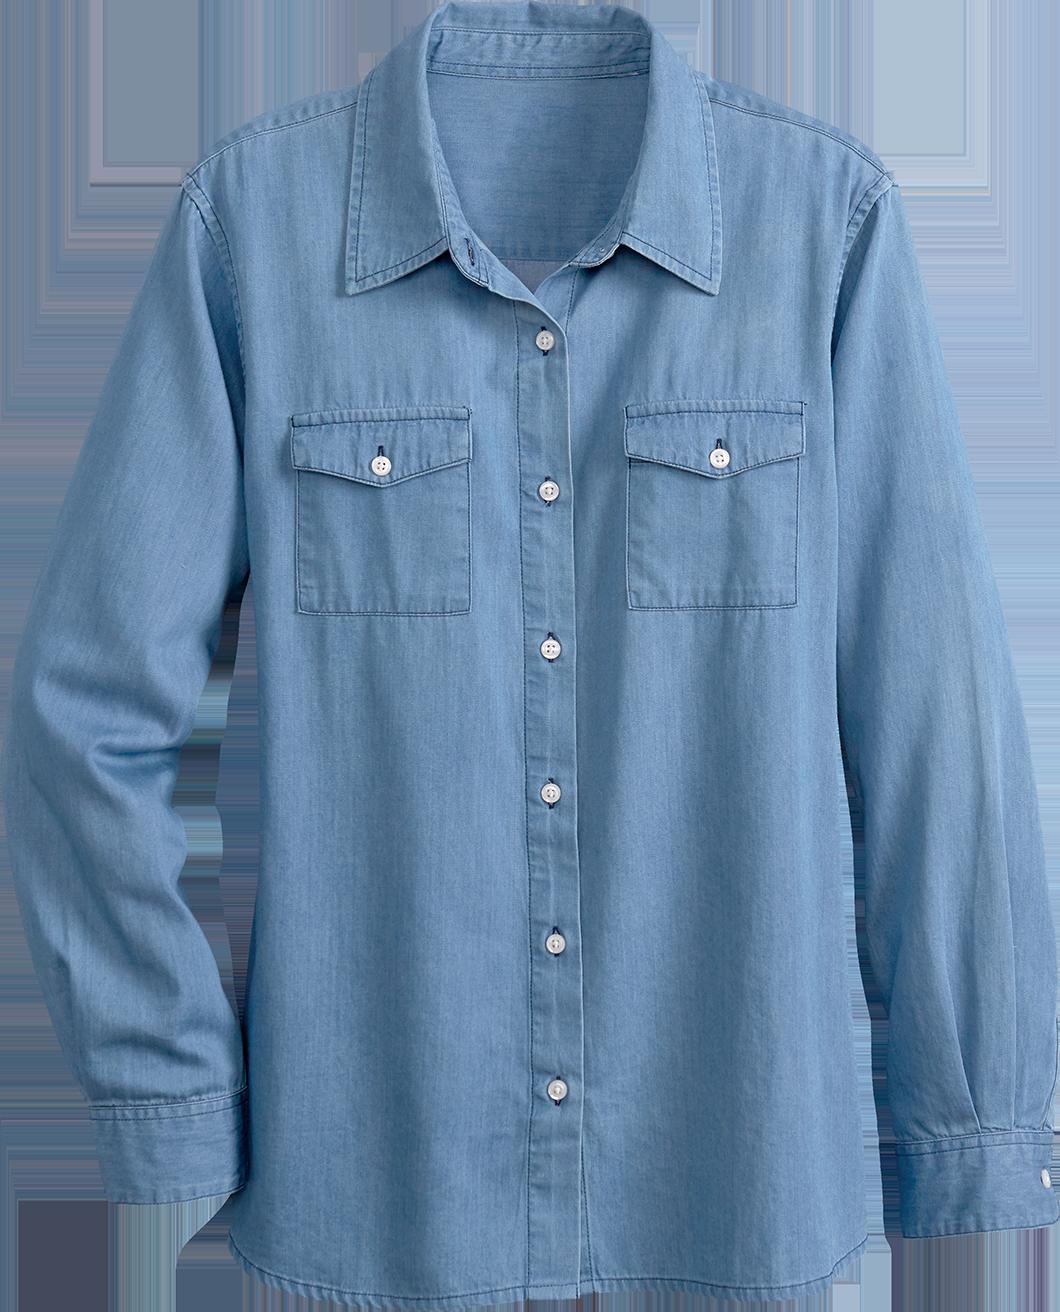 Long Sleeve Denim Shirt For Women